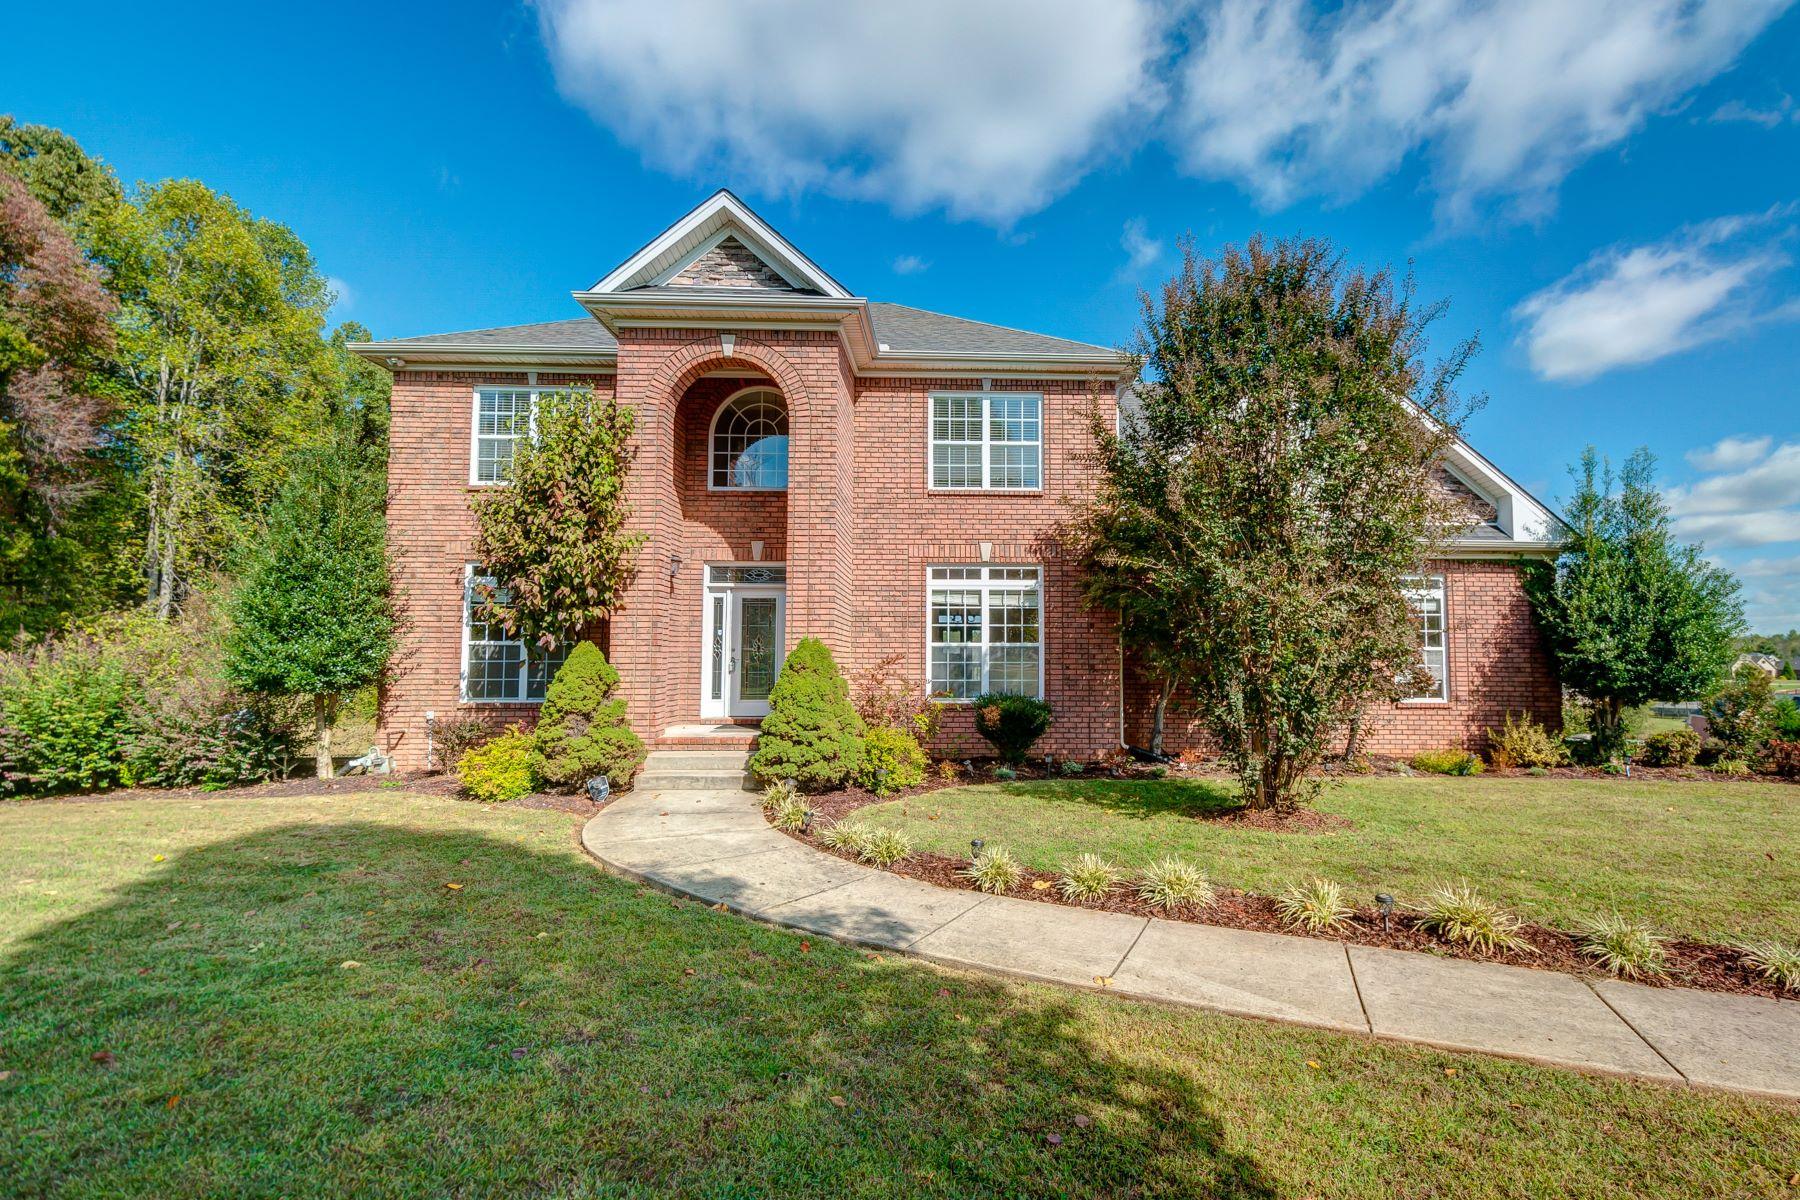 Single Family Homes для того Продажа на Beautiful Home in Desired Location! 3060 Joey Court Pleasant View, Теннесси 37146 Соединенные Штаты